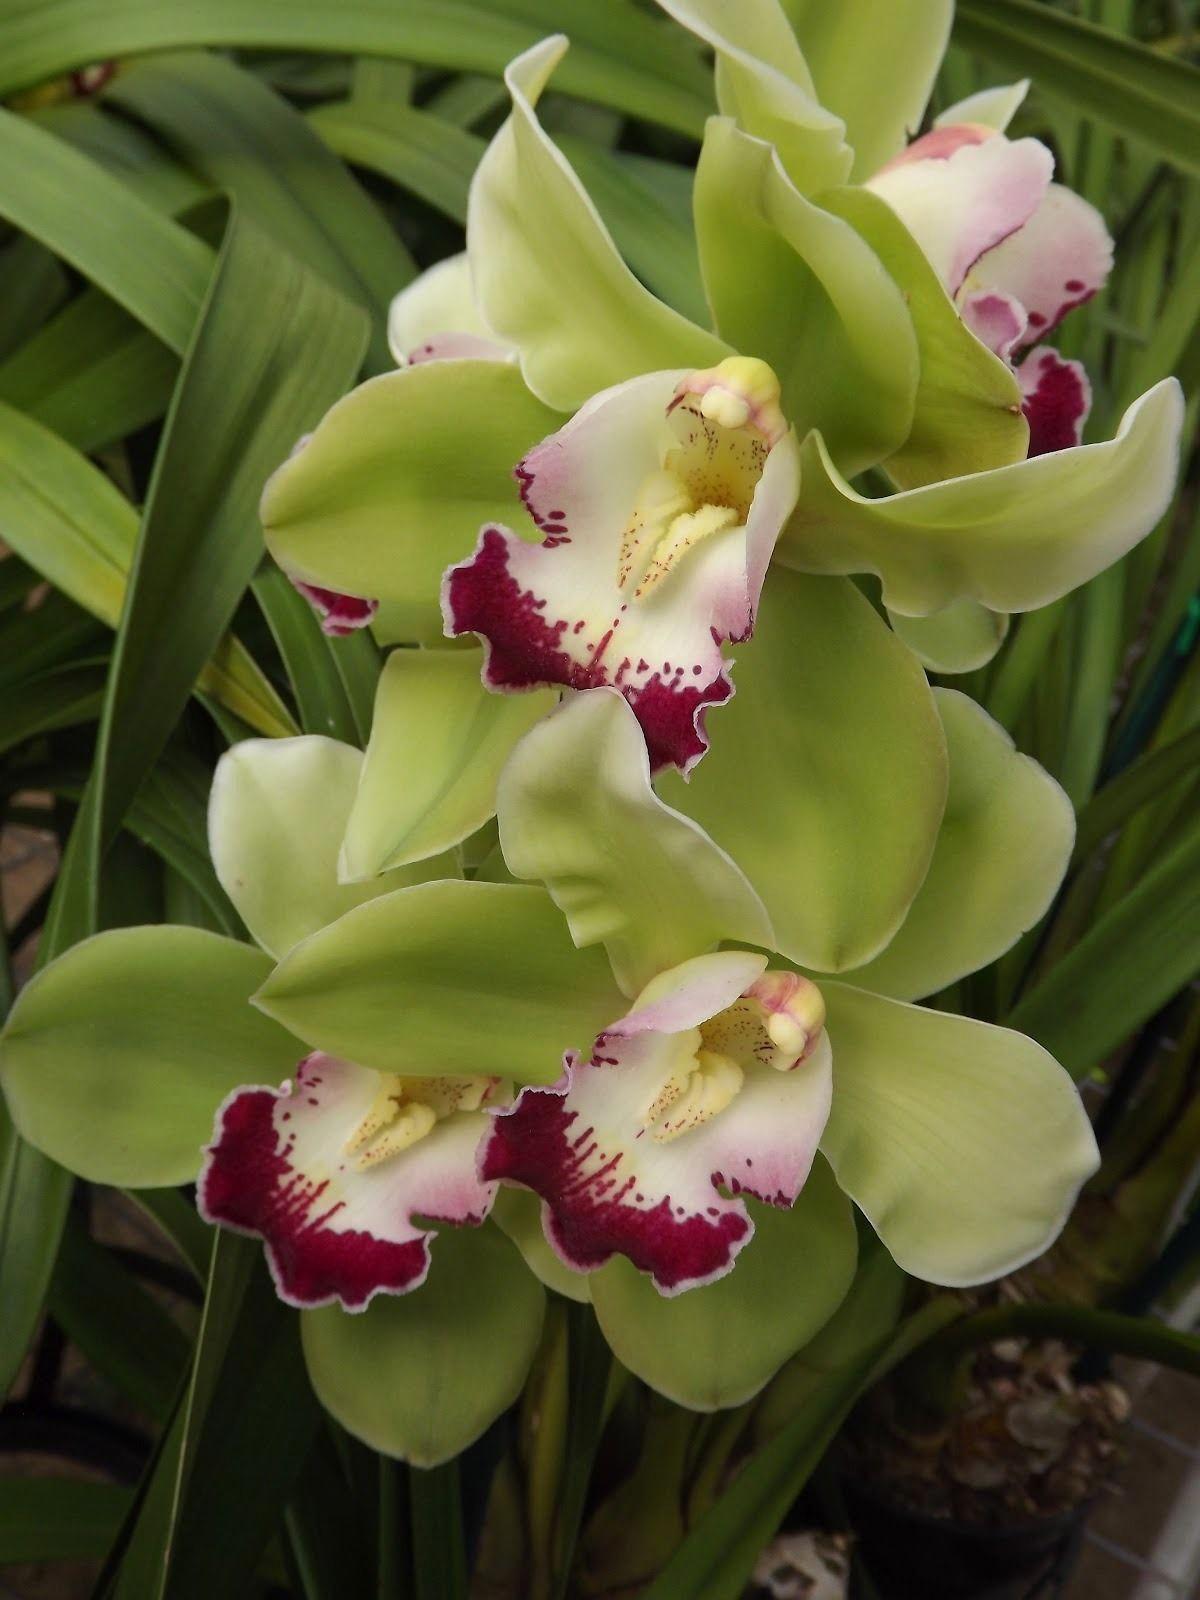 Cymbidium Orchid Cymbiflor Montage X Valley Zenith Discus These Days Cymbidium Orchids Are The Result Of Complex Hybrids Orquideas Cymbidium Orquideas Orquidea